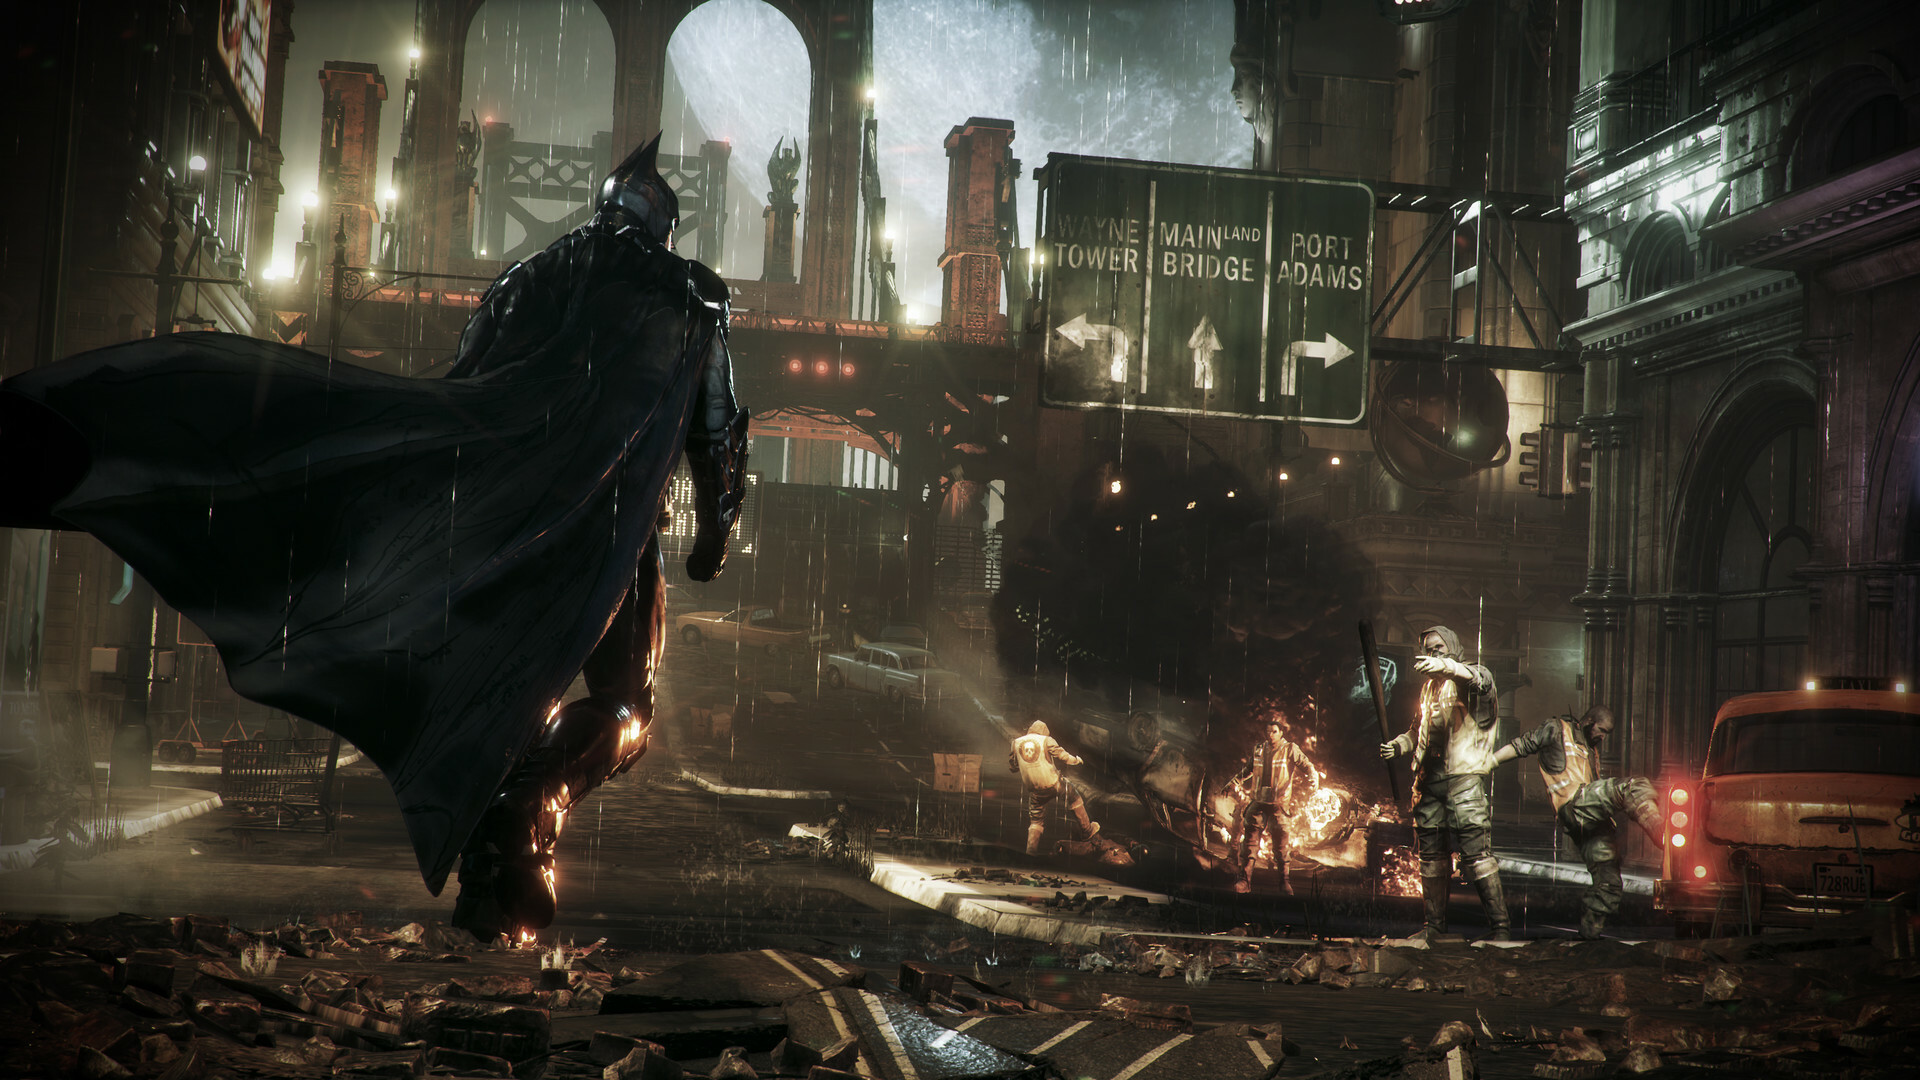 batman-arkham-knight-premium-edition-pc-screenshot-01